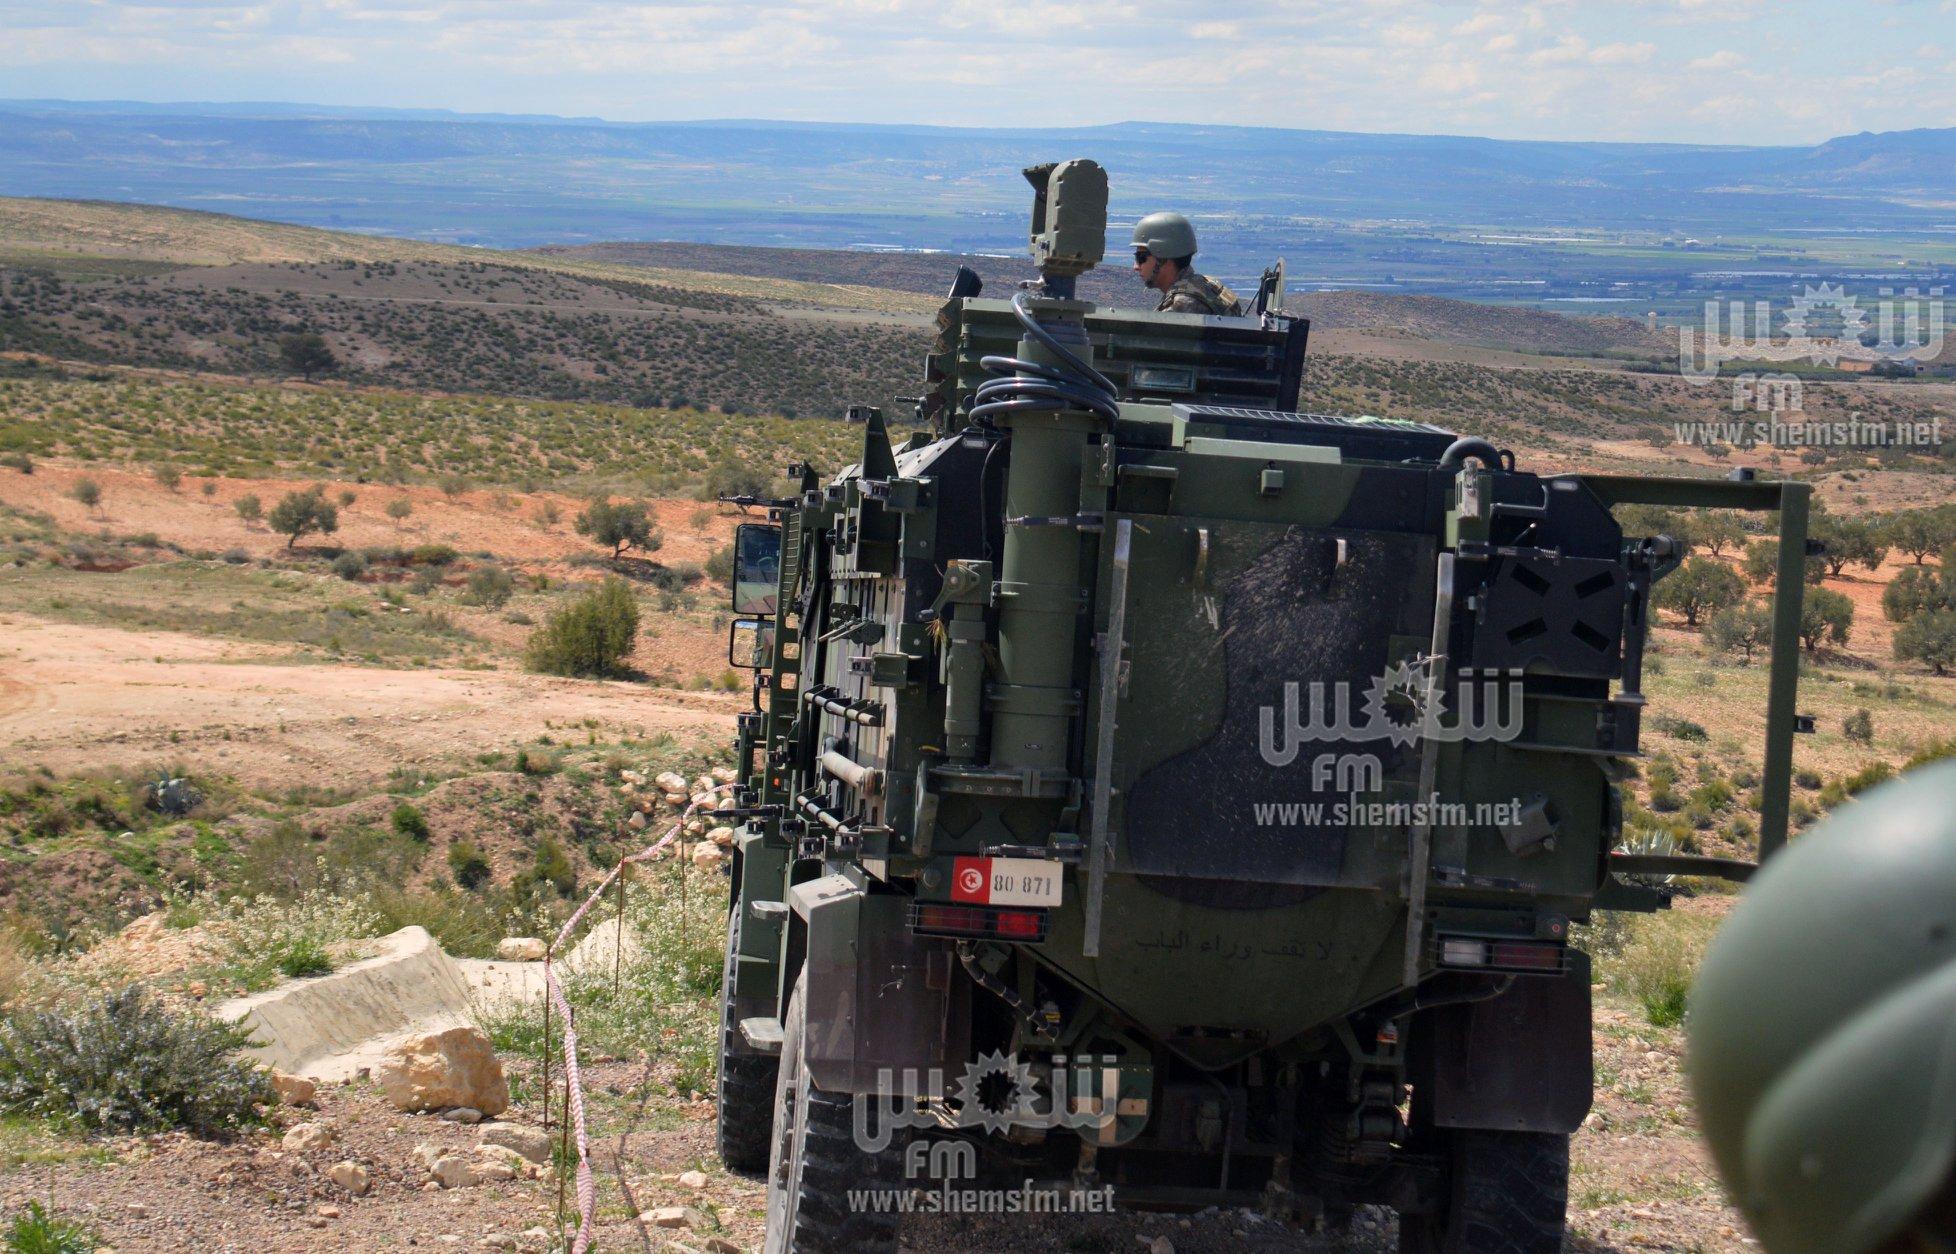 Armée Tunisienne / Tunisian Armed Forces / القوات المسلحة التونسية - Page 16 56870029-2444554708899133-6150453636716560384-o